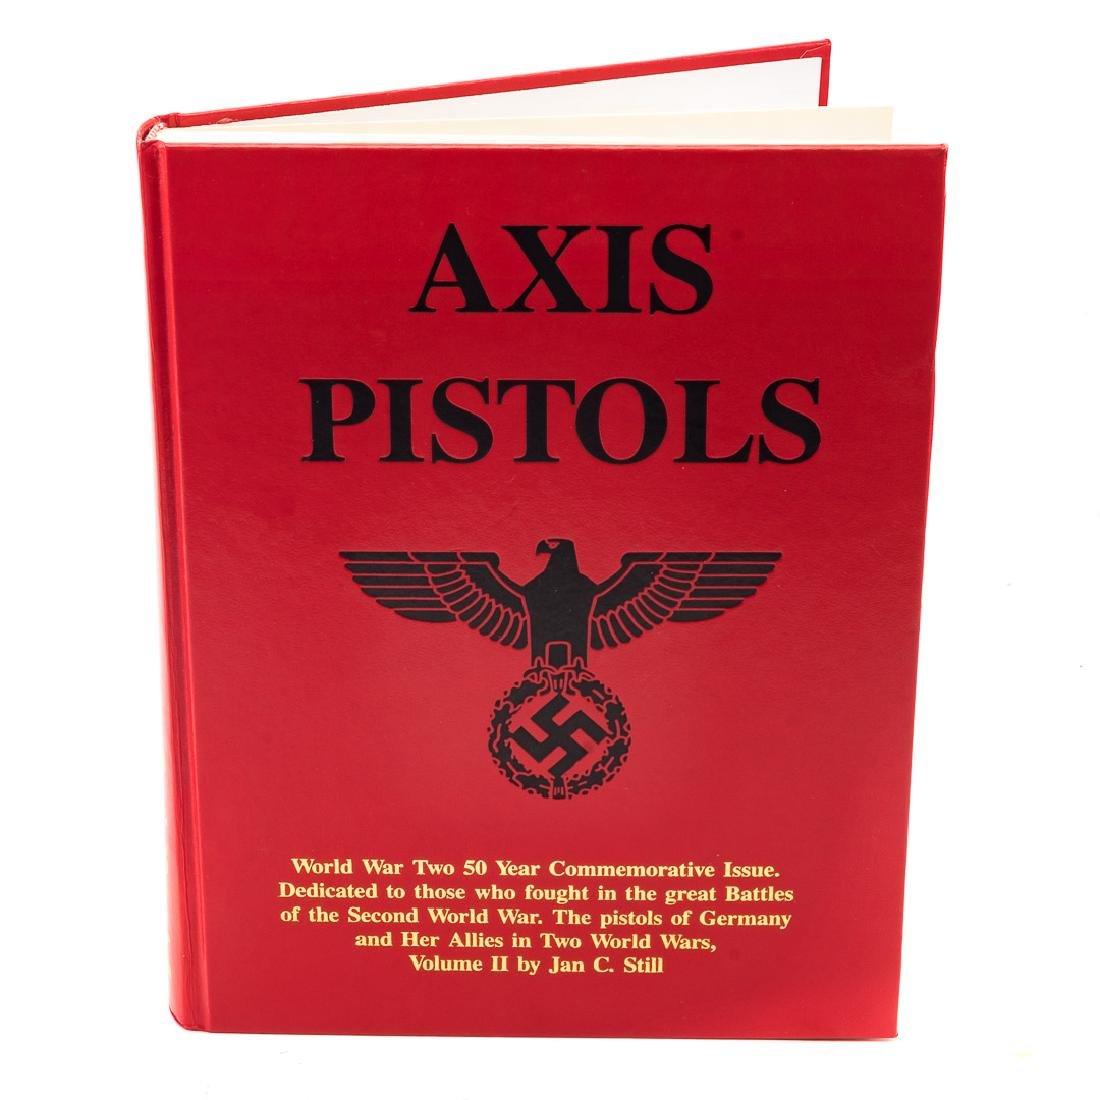 Axis Pistols Hardback